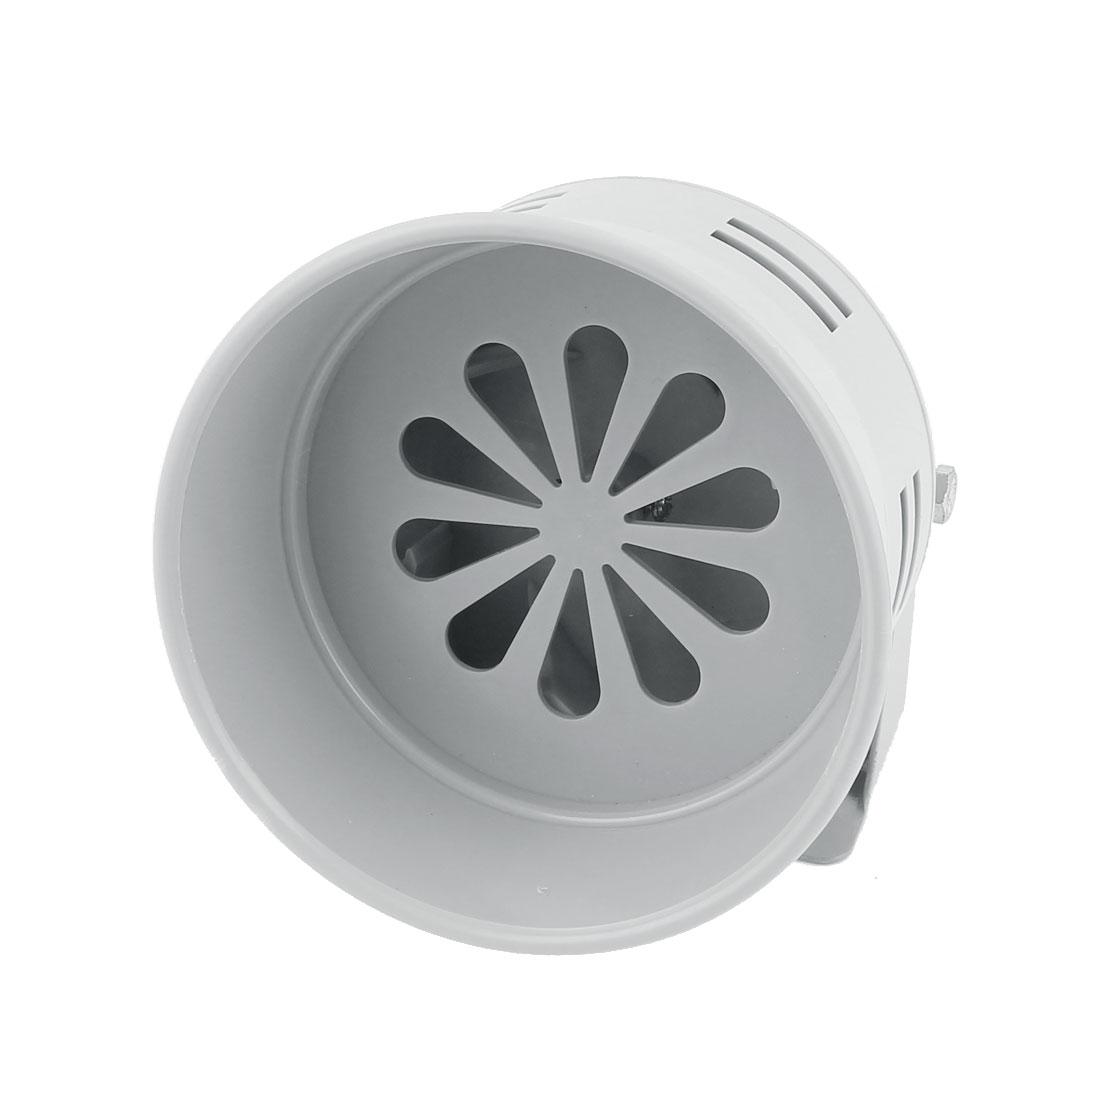 MS-290 Gray Plastic Industrial Alarm Sound Motor Siren Horn 130dB DC 24V